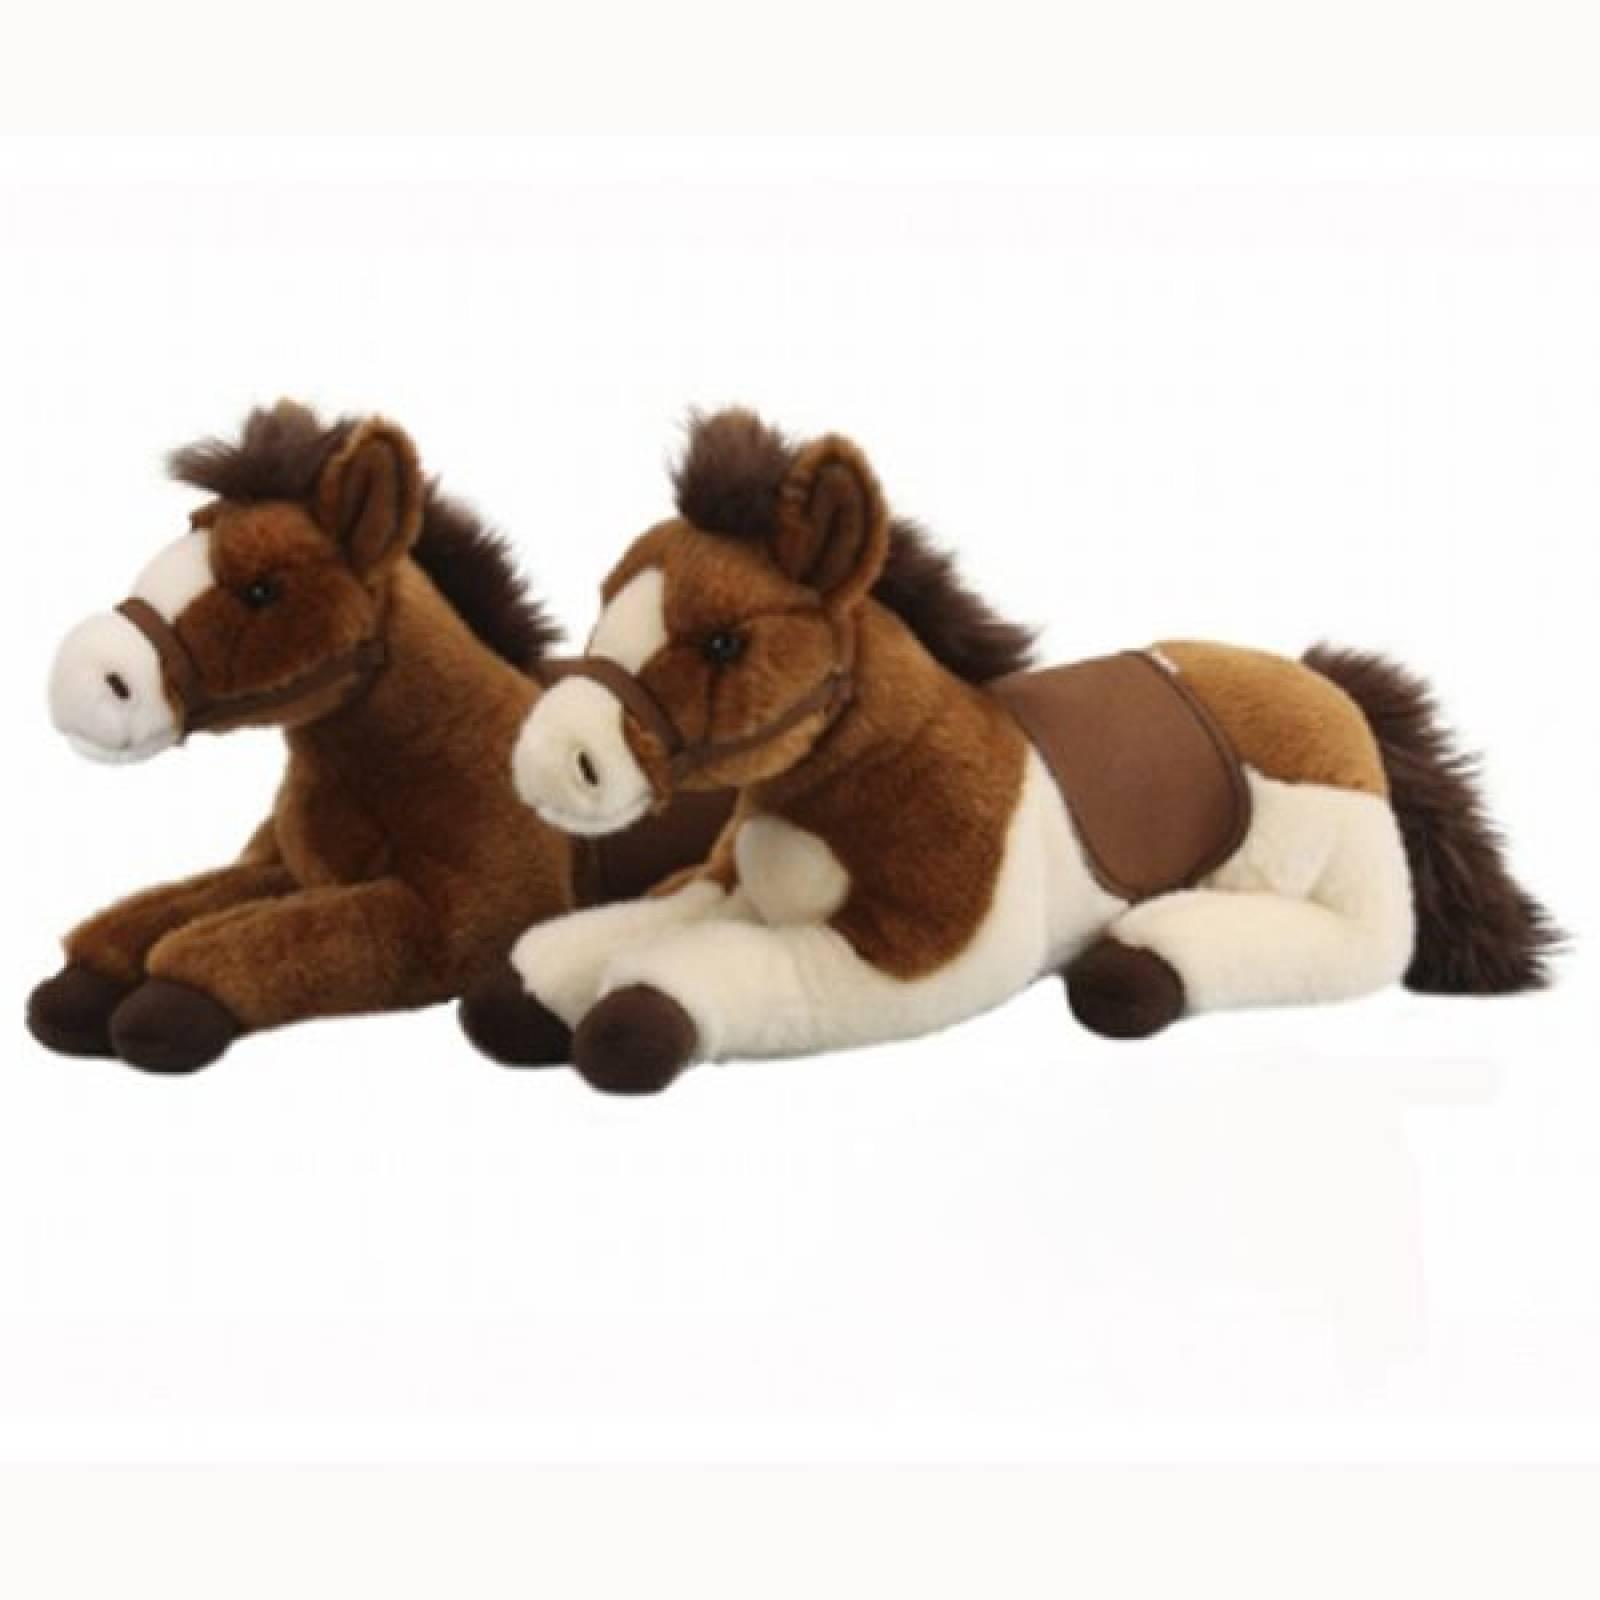 Horse Soft Toy 36cm 0+yrs